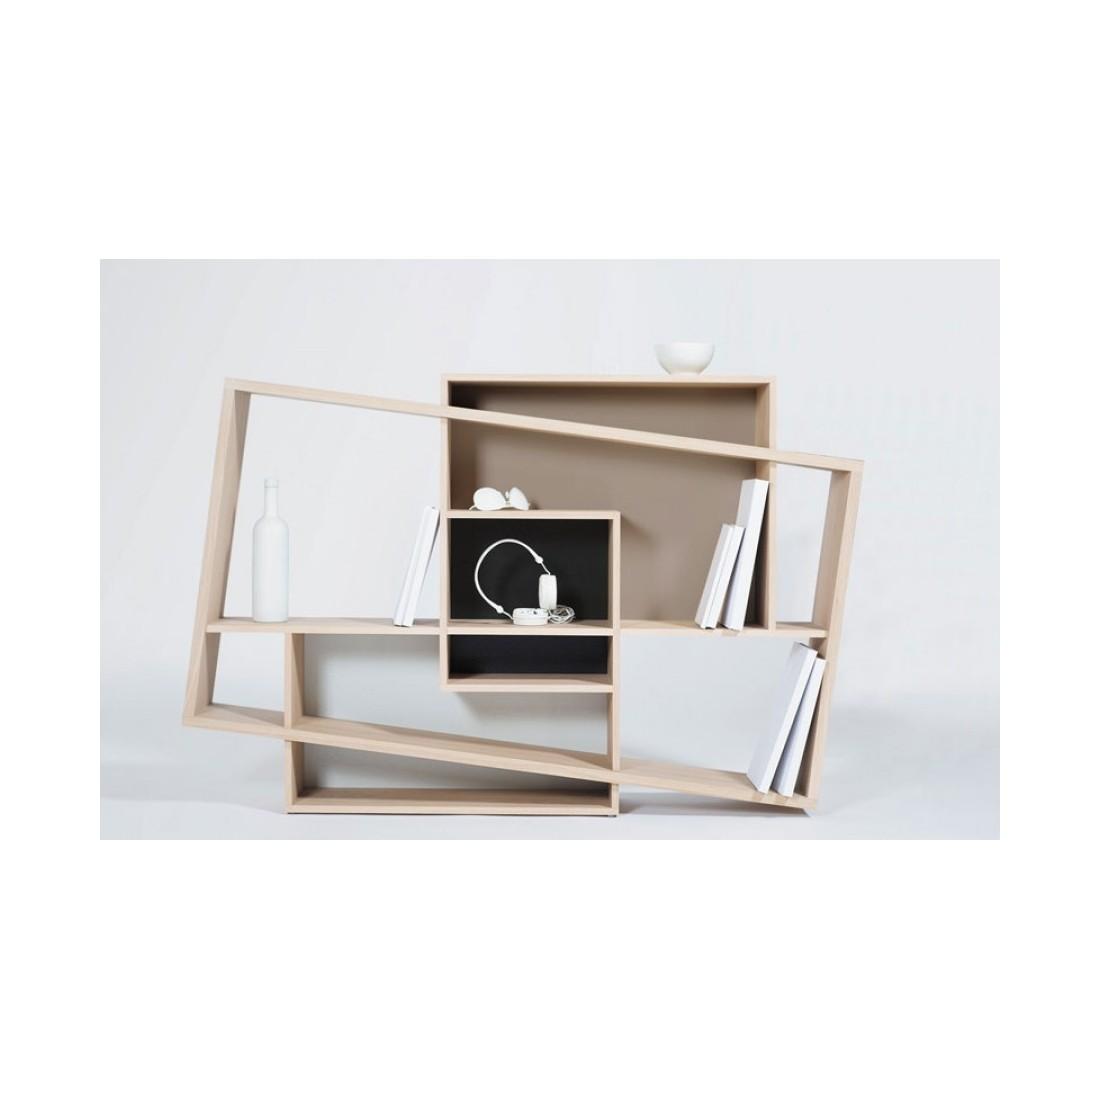 console isboa design en ch ne drugeot labo fabrication 100 fran aise. Black Bedroom Furniture Sets. Home Design Ideas